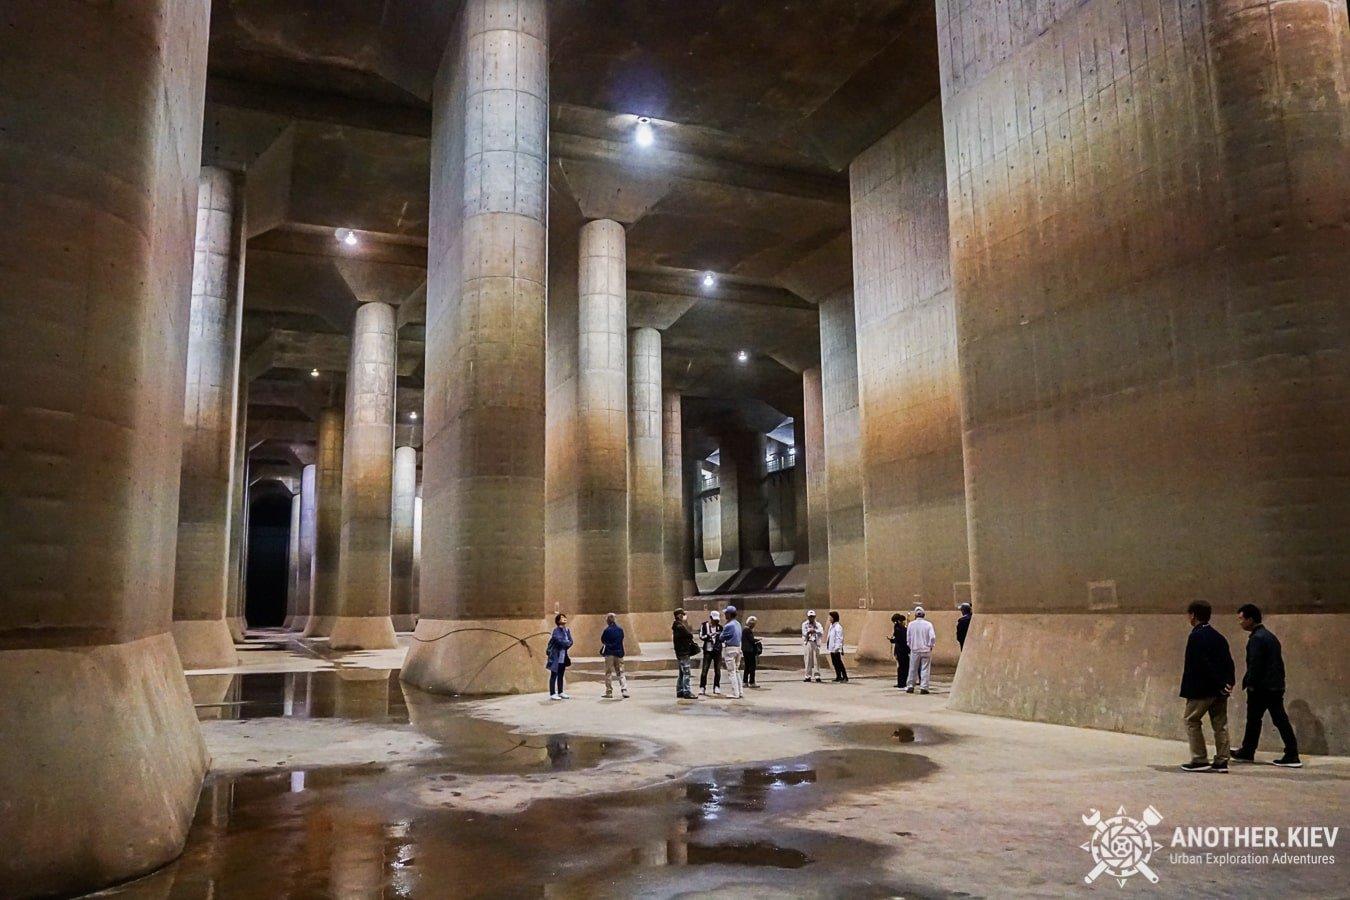 j-cans-urbex-tour-9-min Экскурсия в Токийский противопаводковый коллектор